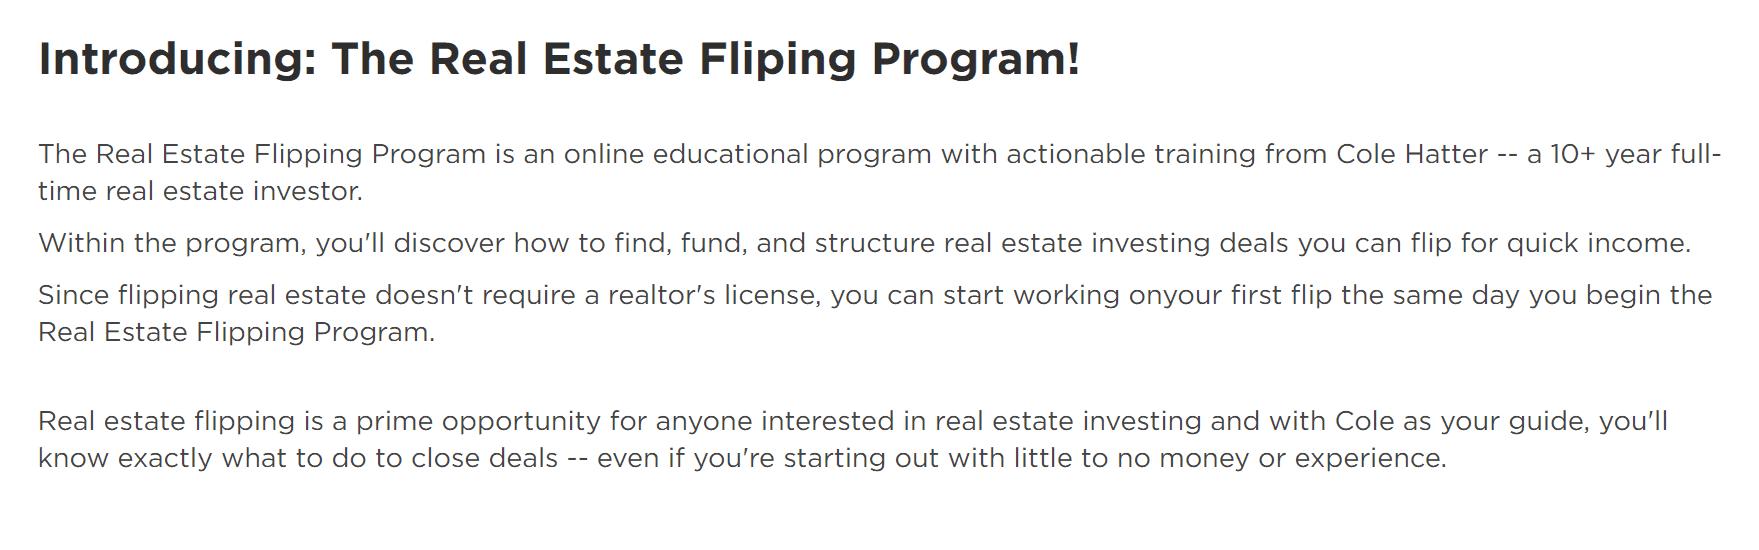 real estate flipping program